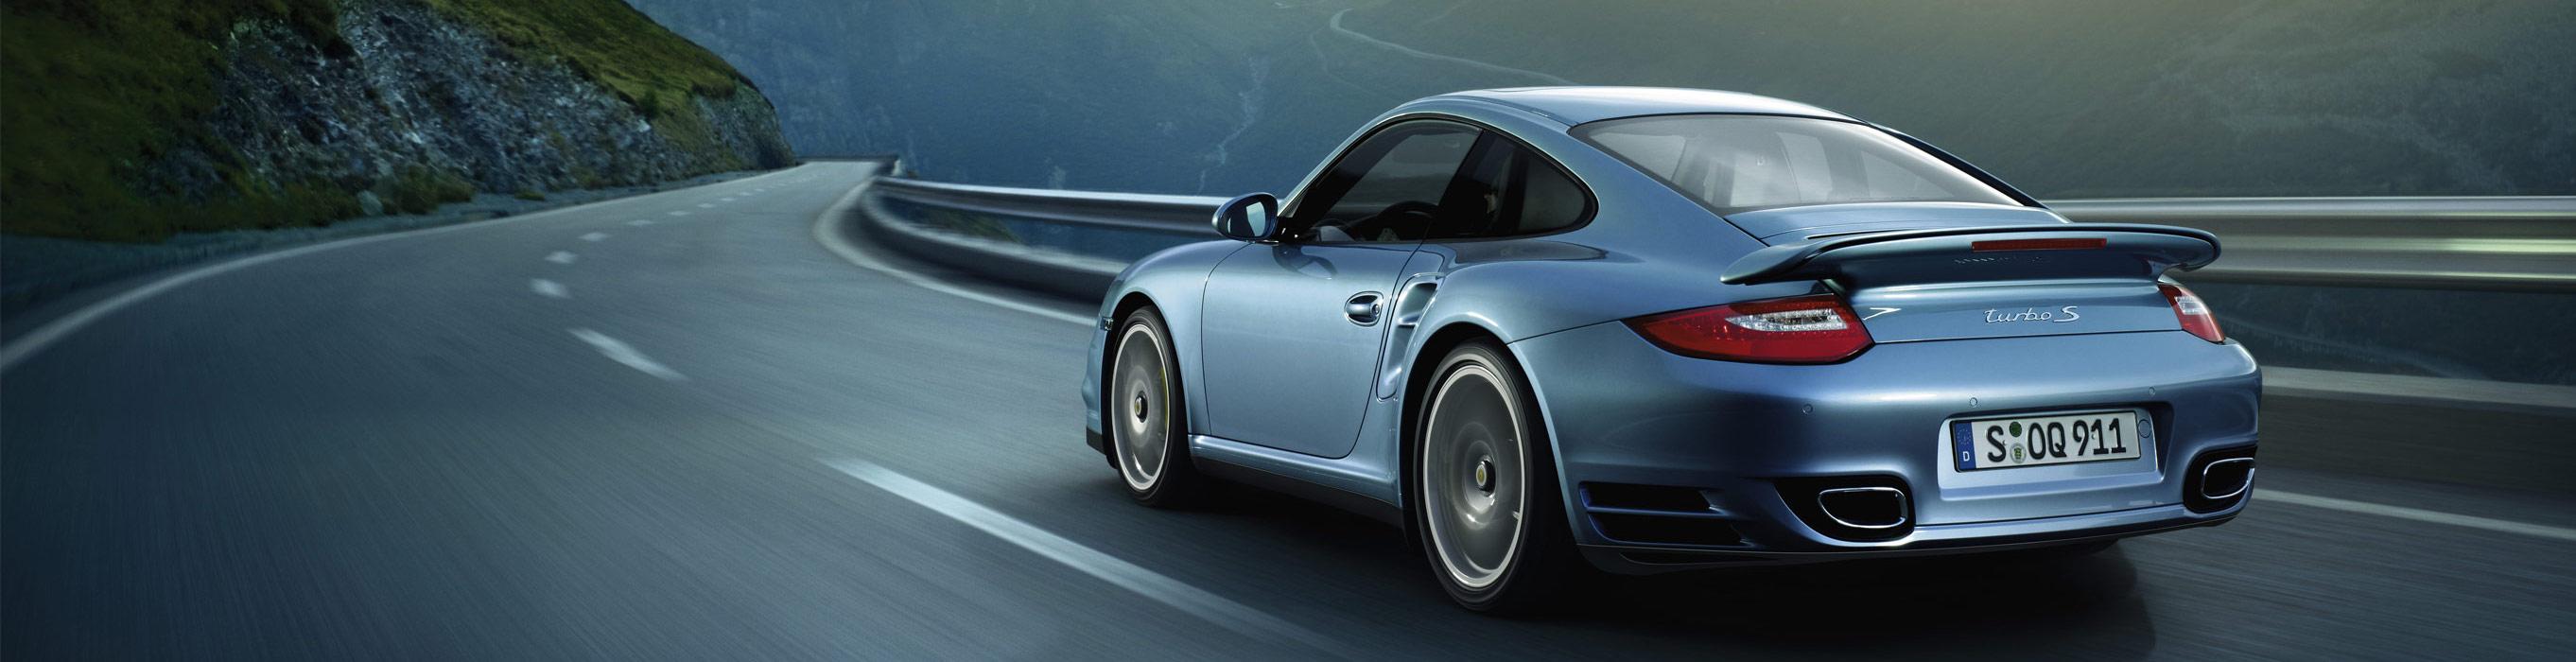 QUE COCHE - Página 6 Porsche-911-Turbo-S-Custom2